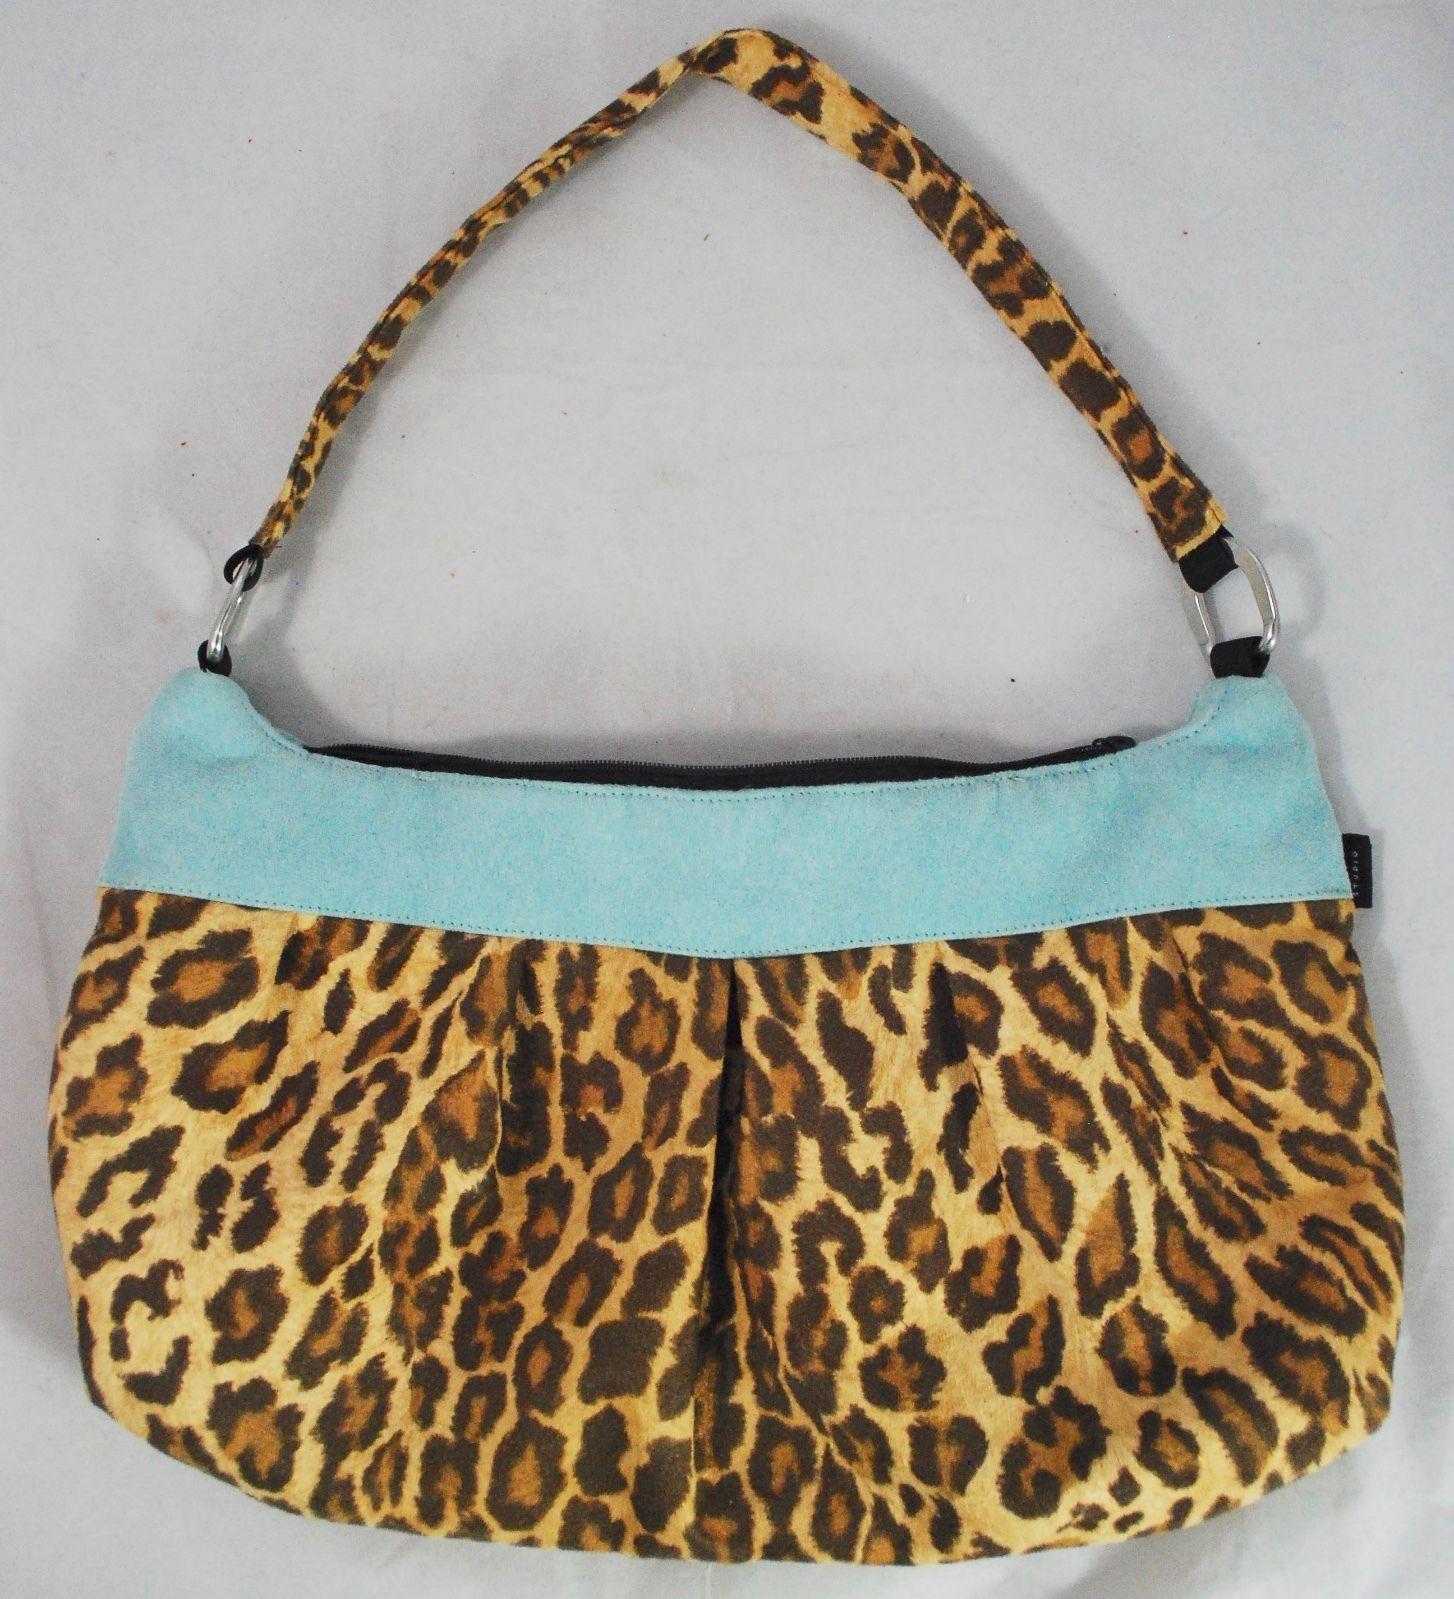 "LISA LILL STUDIO Leopard Print Hobo Bag Purse - 13""x8"" - Tapestry Interior"